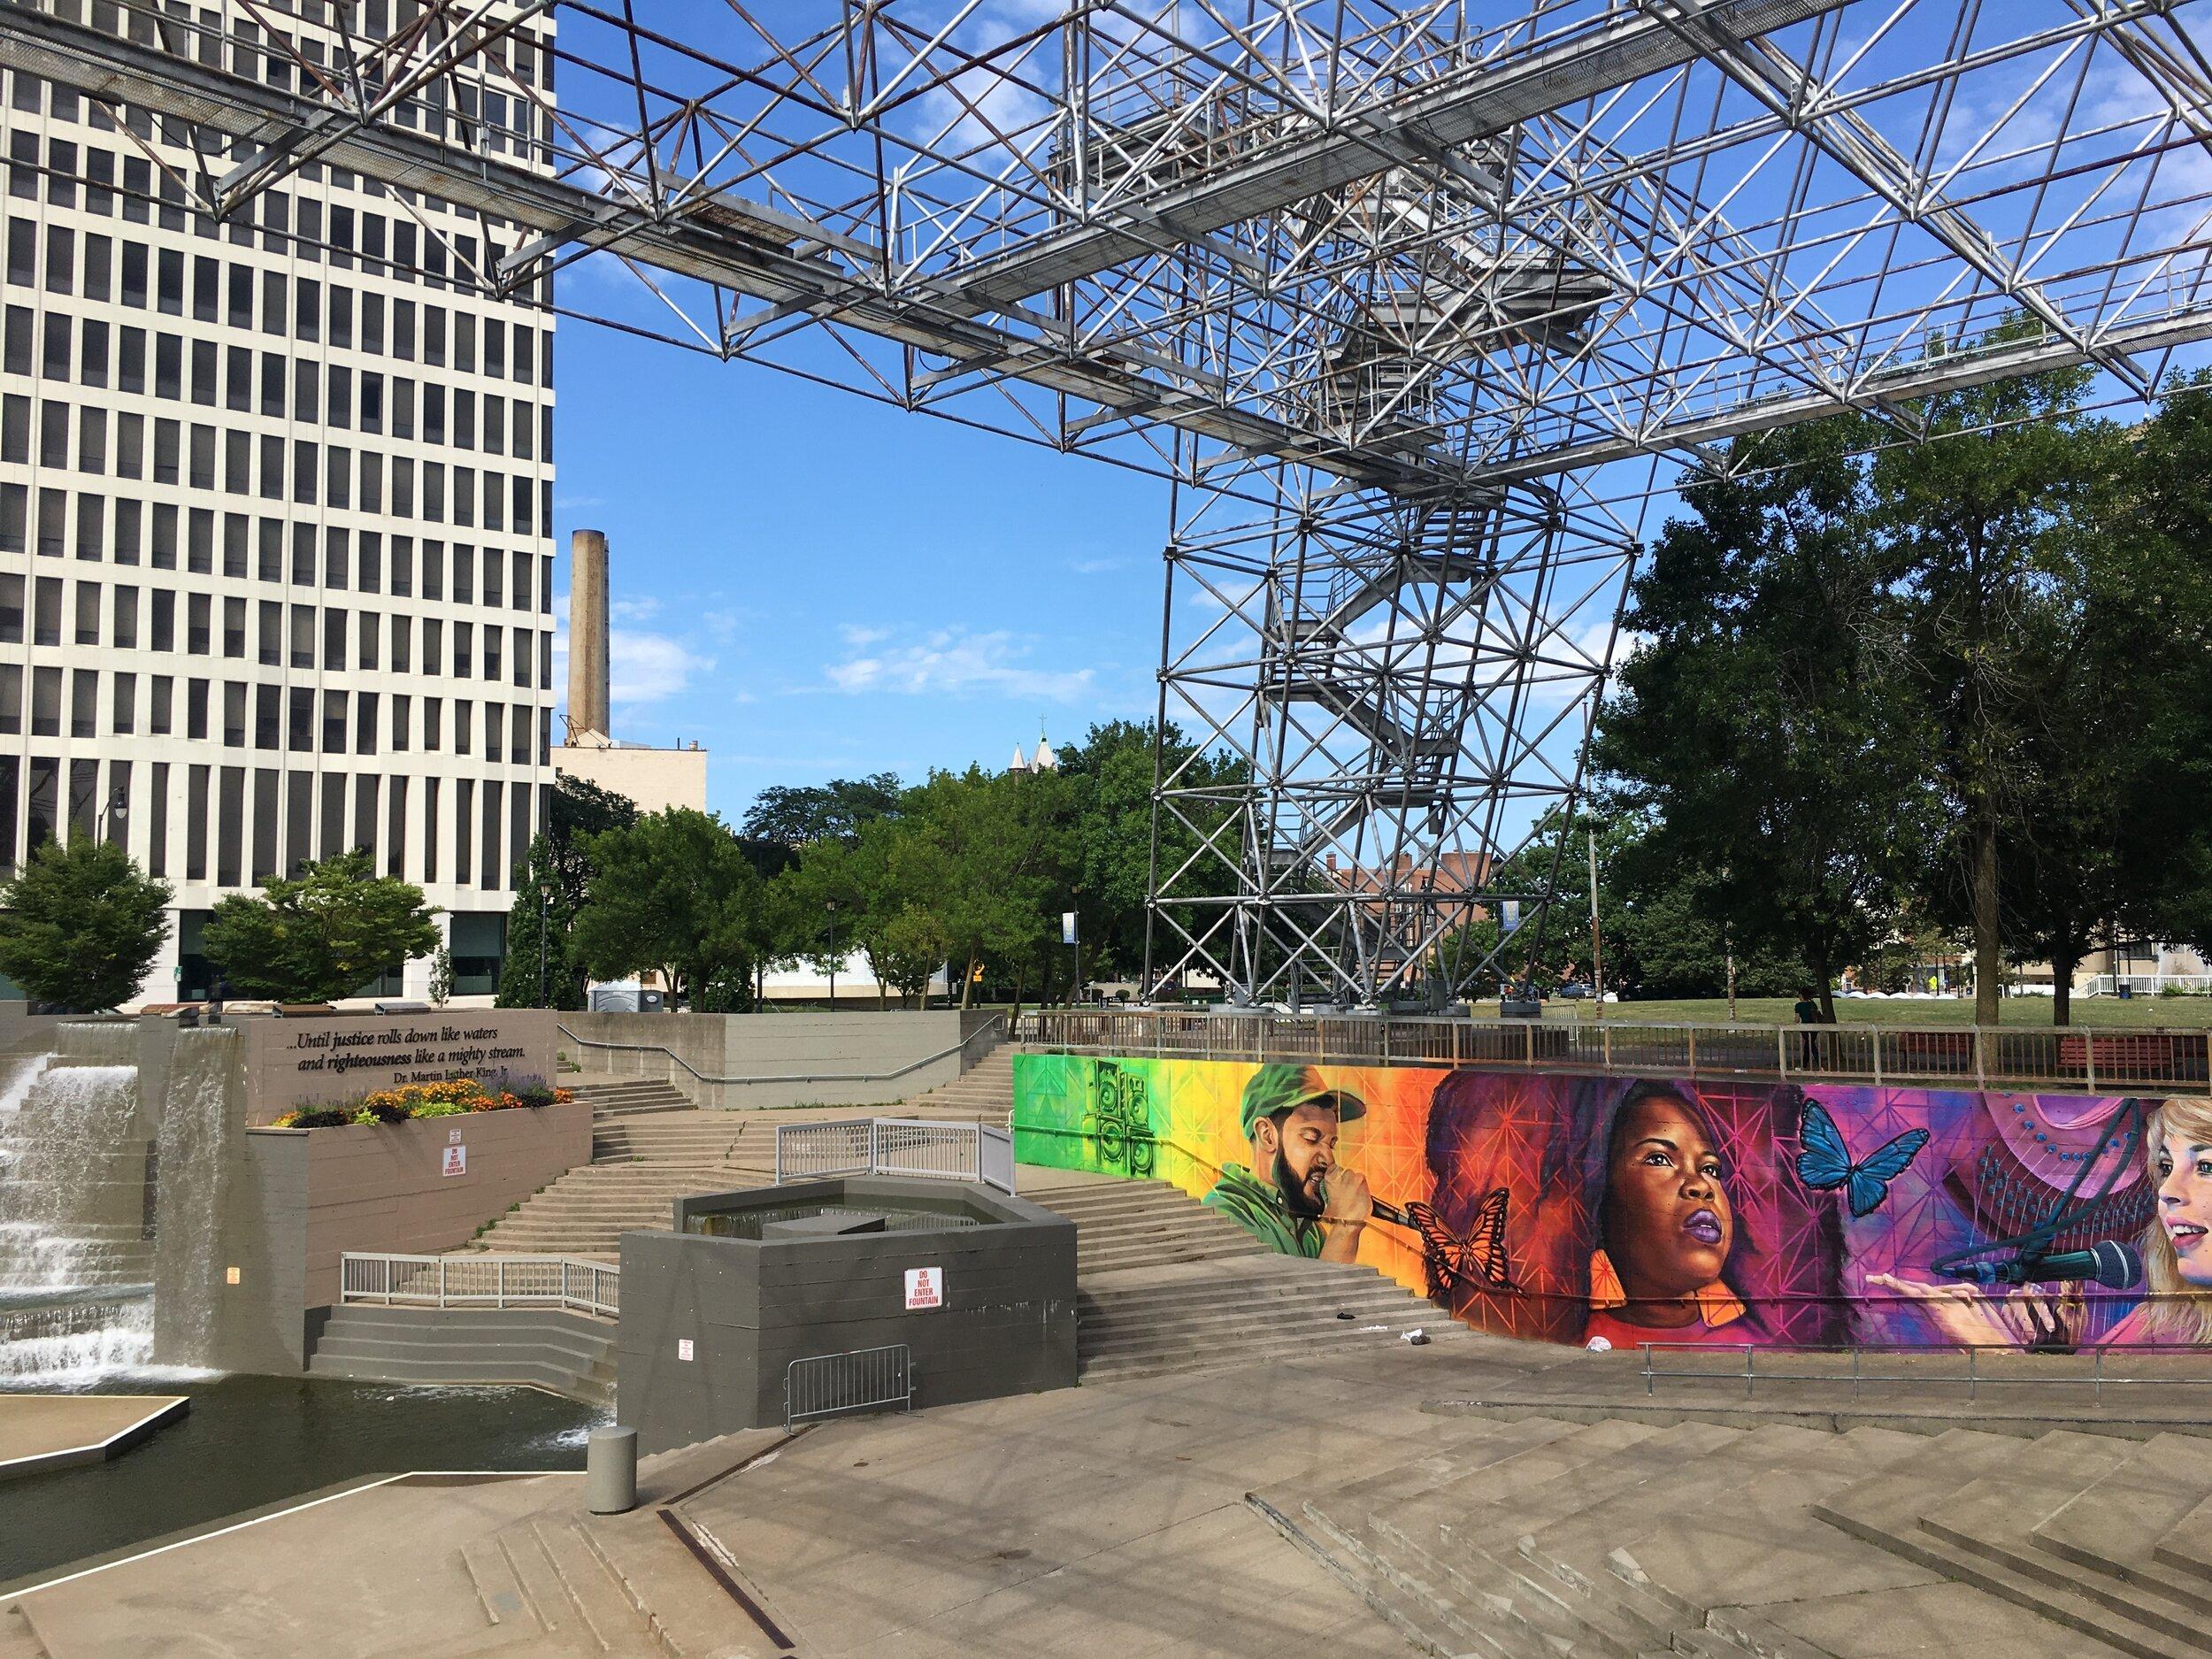 Dr. Martin Luther King Jr. Memorial Park